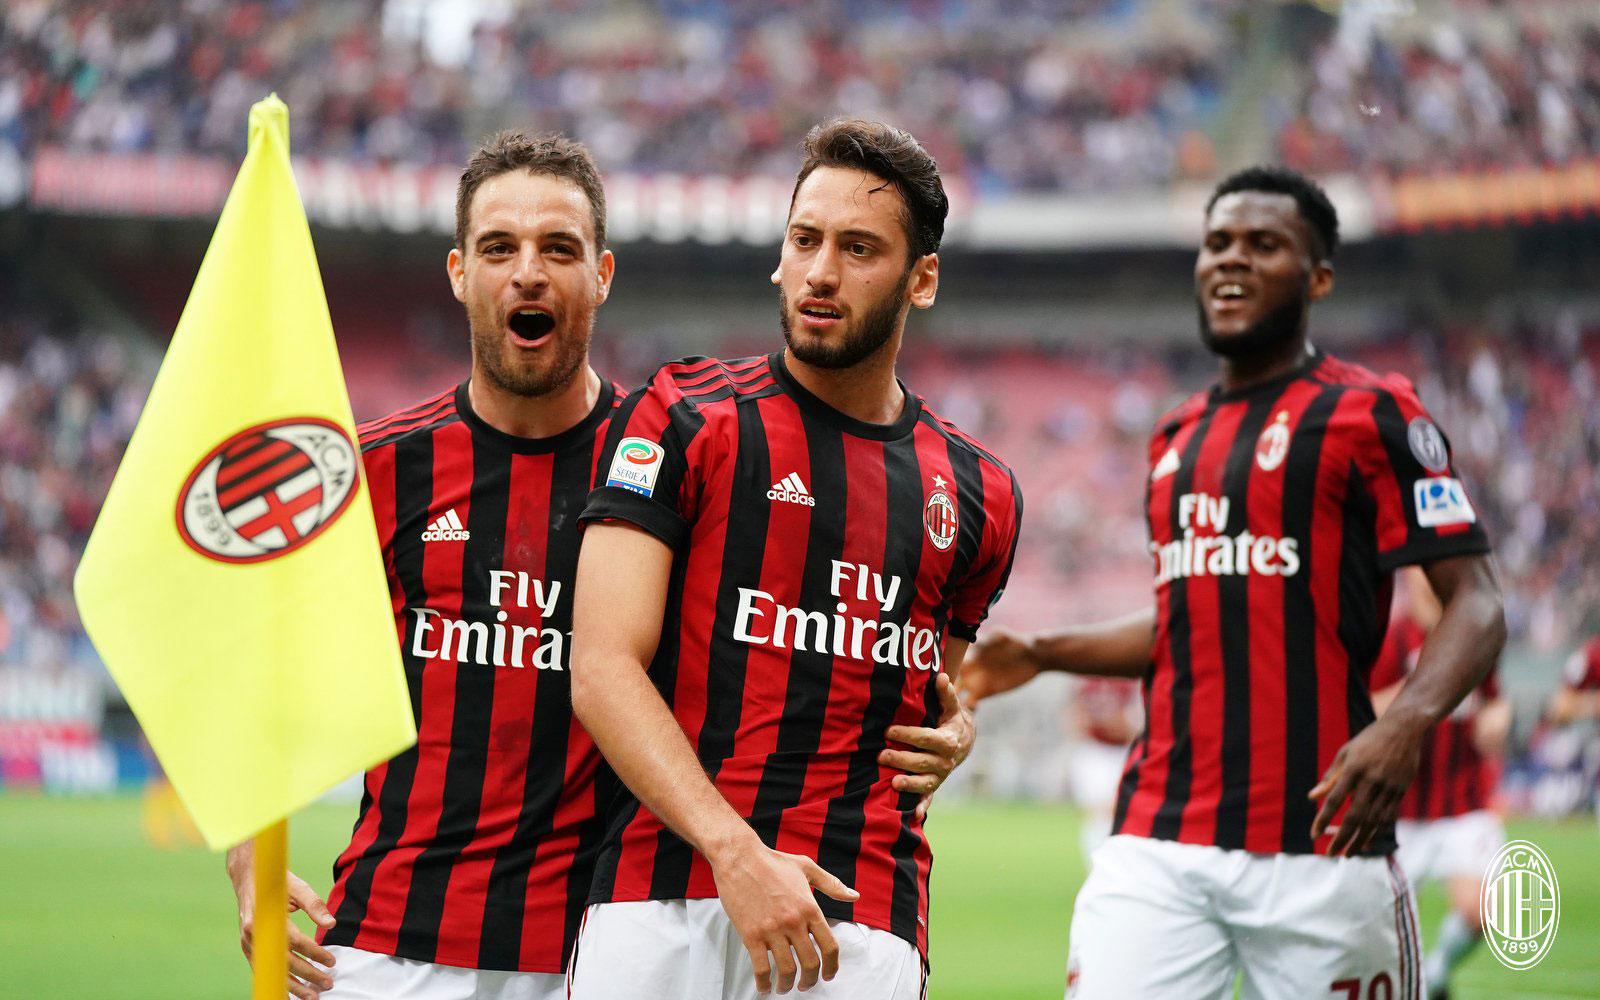 Hakan Çalhanoğlu, Giacomo Bonaventura and Franck Kessié celebrating during Milan-Hellas Verona at Stadio San Siro on May 5, 2018. (@acmilan.com)